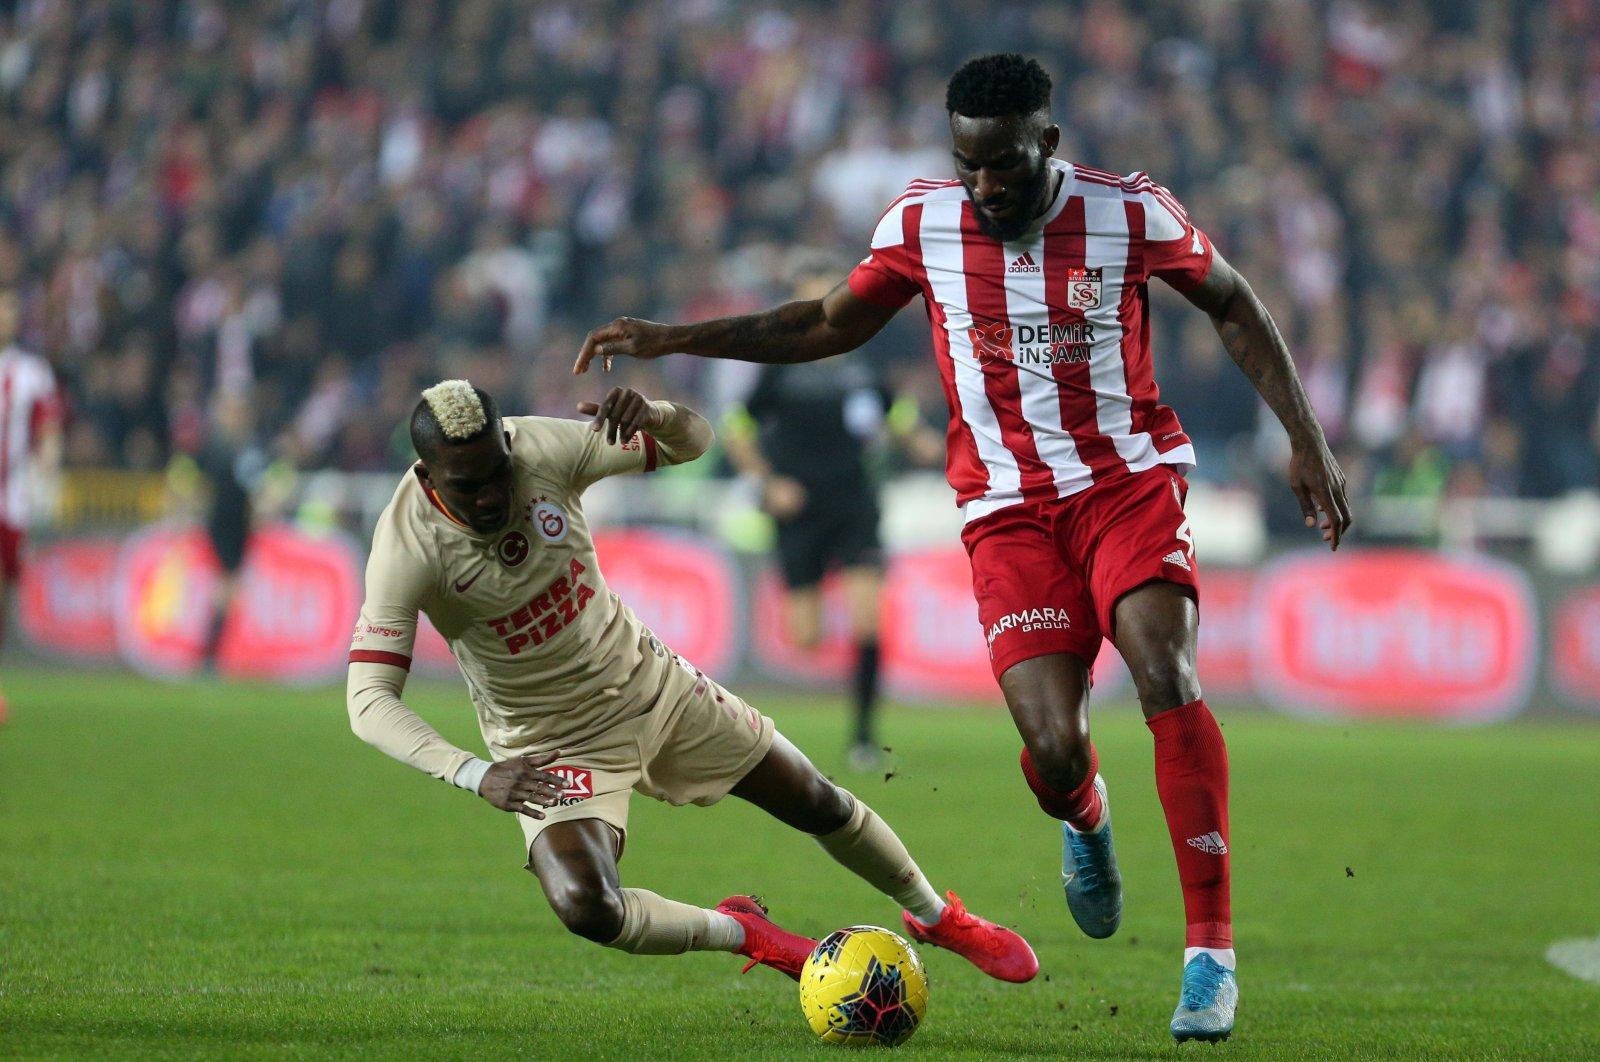 Galatasaray's Henry Onyekuru (L) in action against Sivasspor's Appindangoye (R), Sivas, March 8, 2020. (AA Photo)